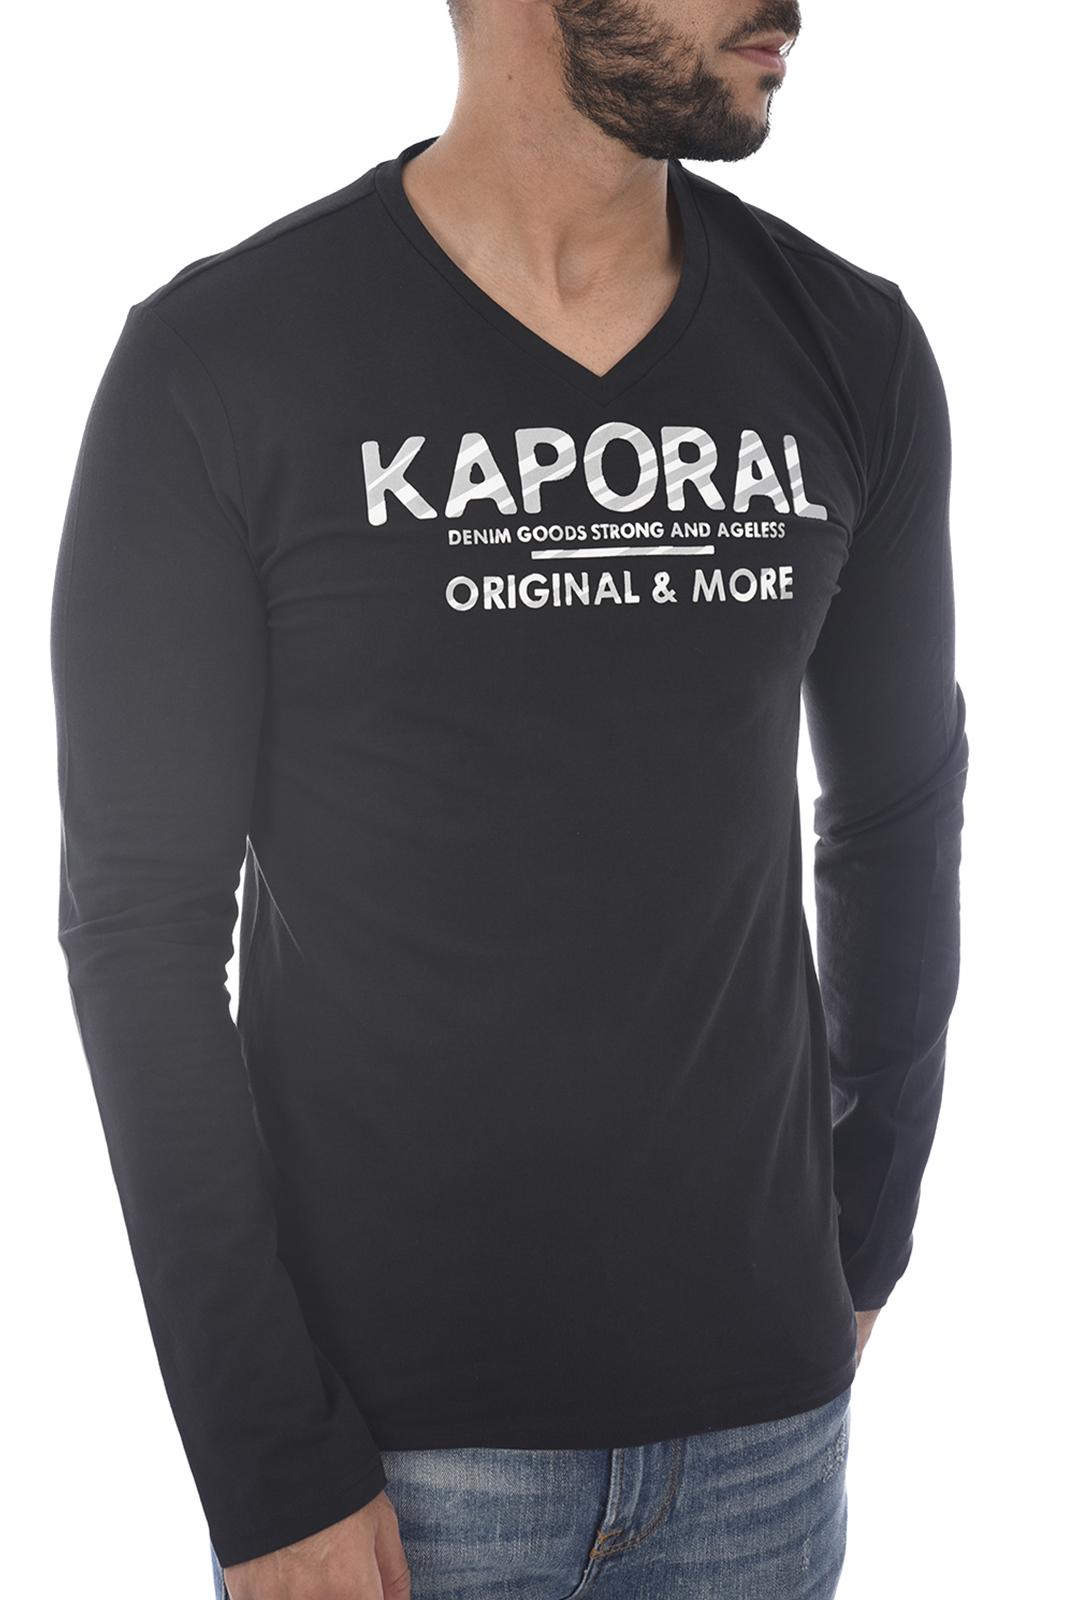 Tee-shirts  Kaporal SHINE H18M12 BLACK